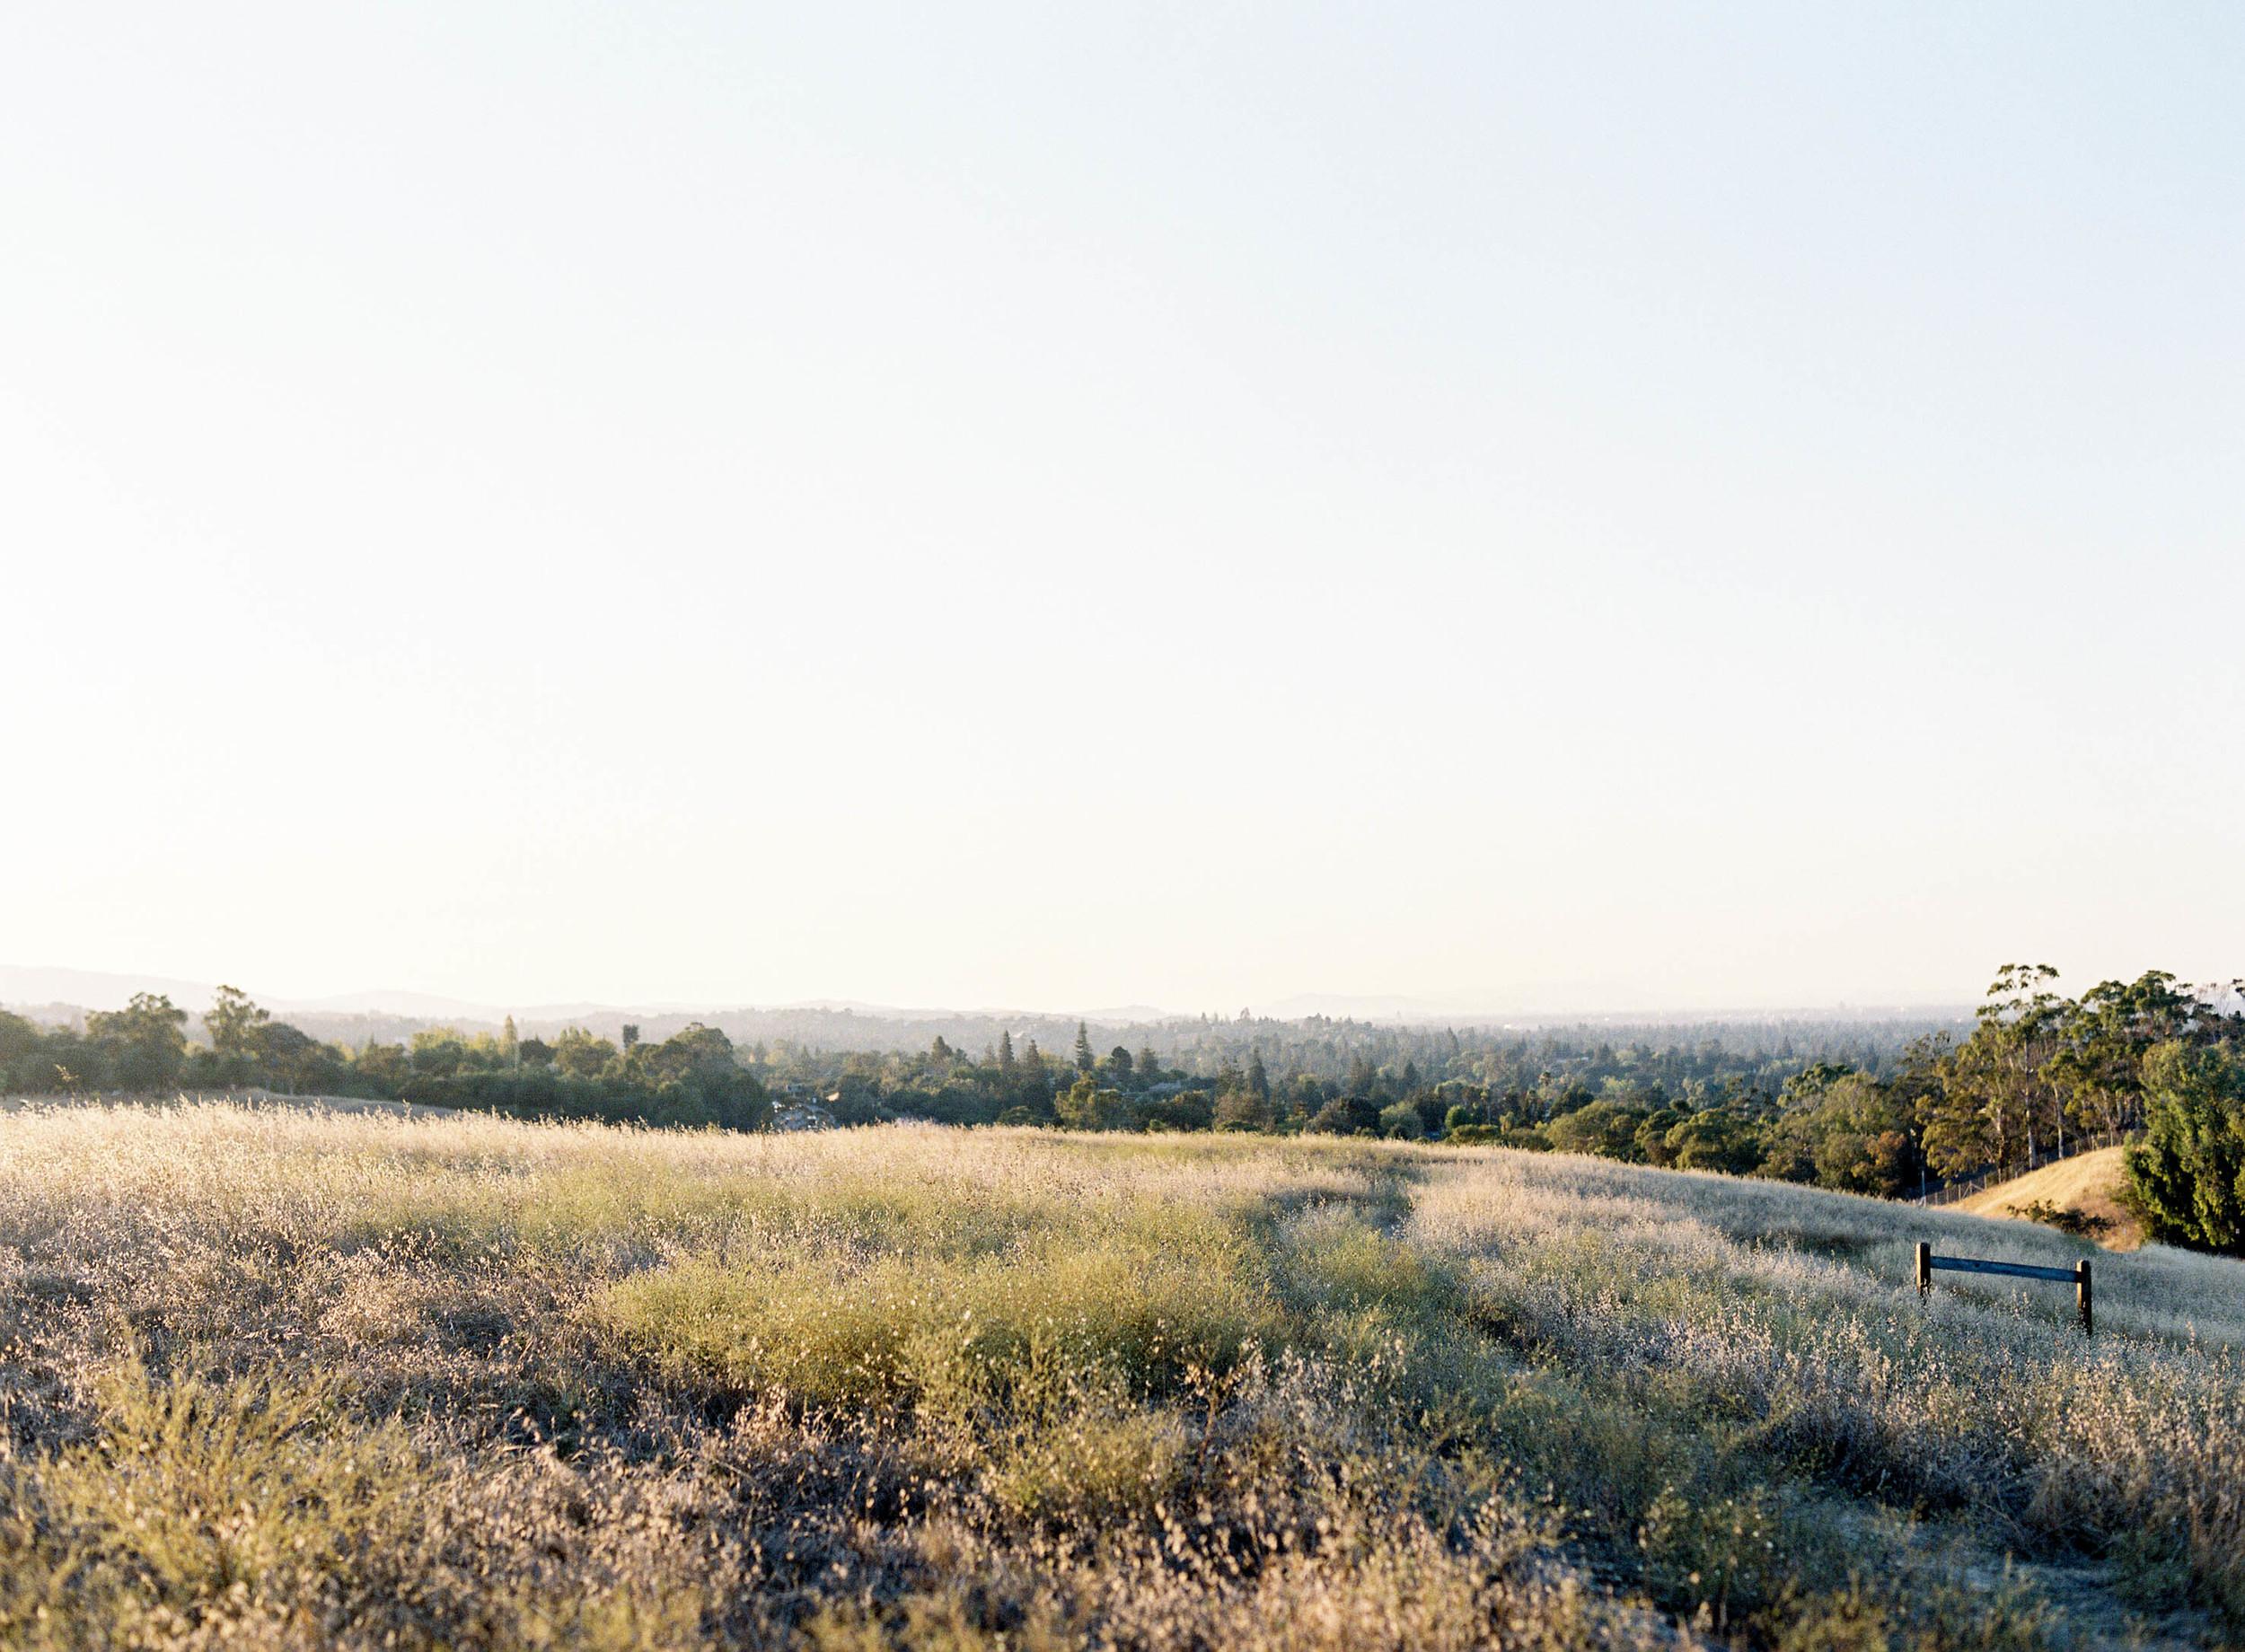 Meghan Mehan Photography - Fine Art Film Wedding Photography - San Francisco   Napa   Sonoma   Big Sur   Chicago   Minneapolis   Milwaukee   Lake Geneva   Door County   Wisconsin 007.jpg